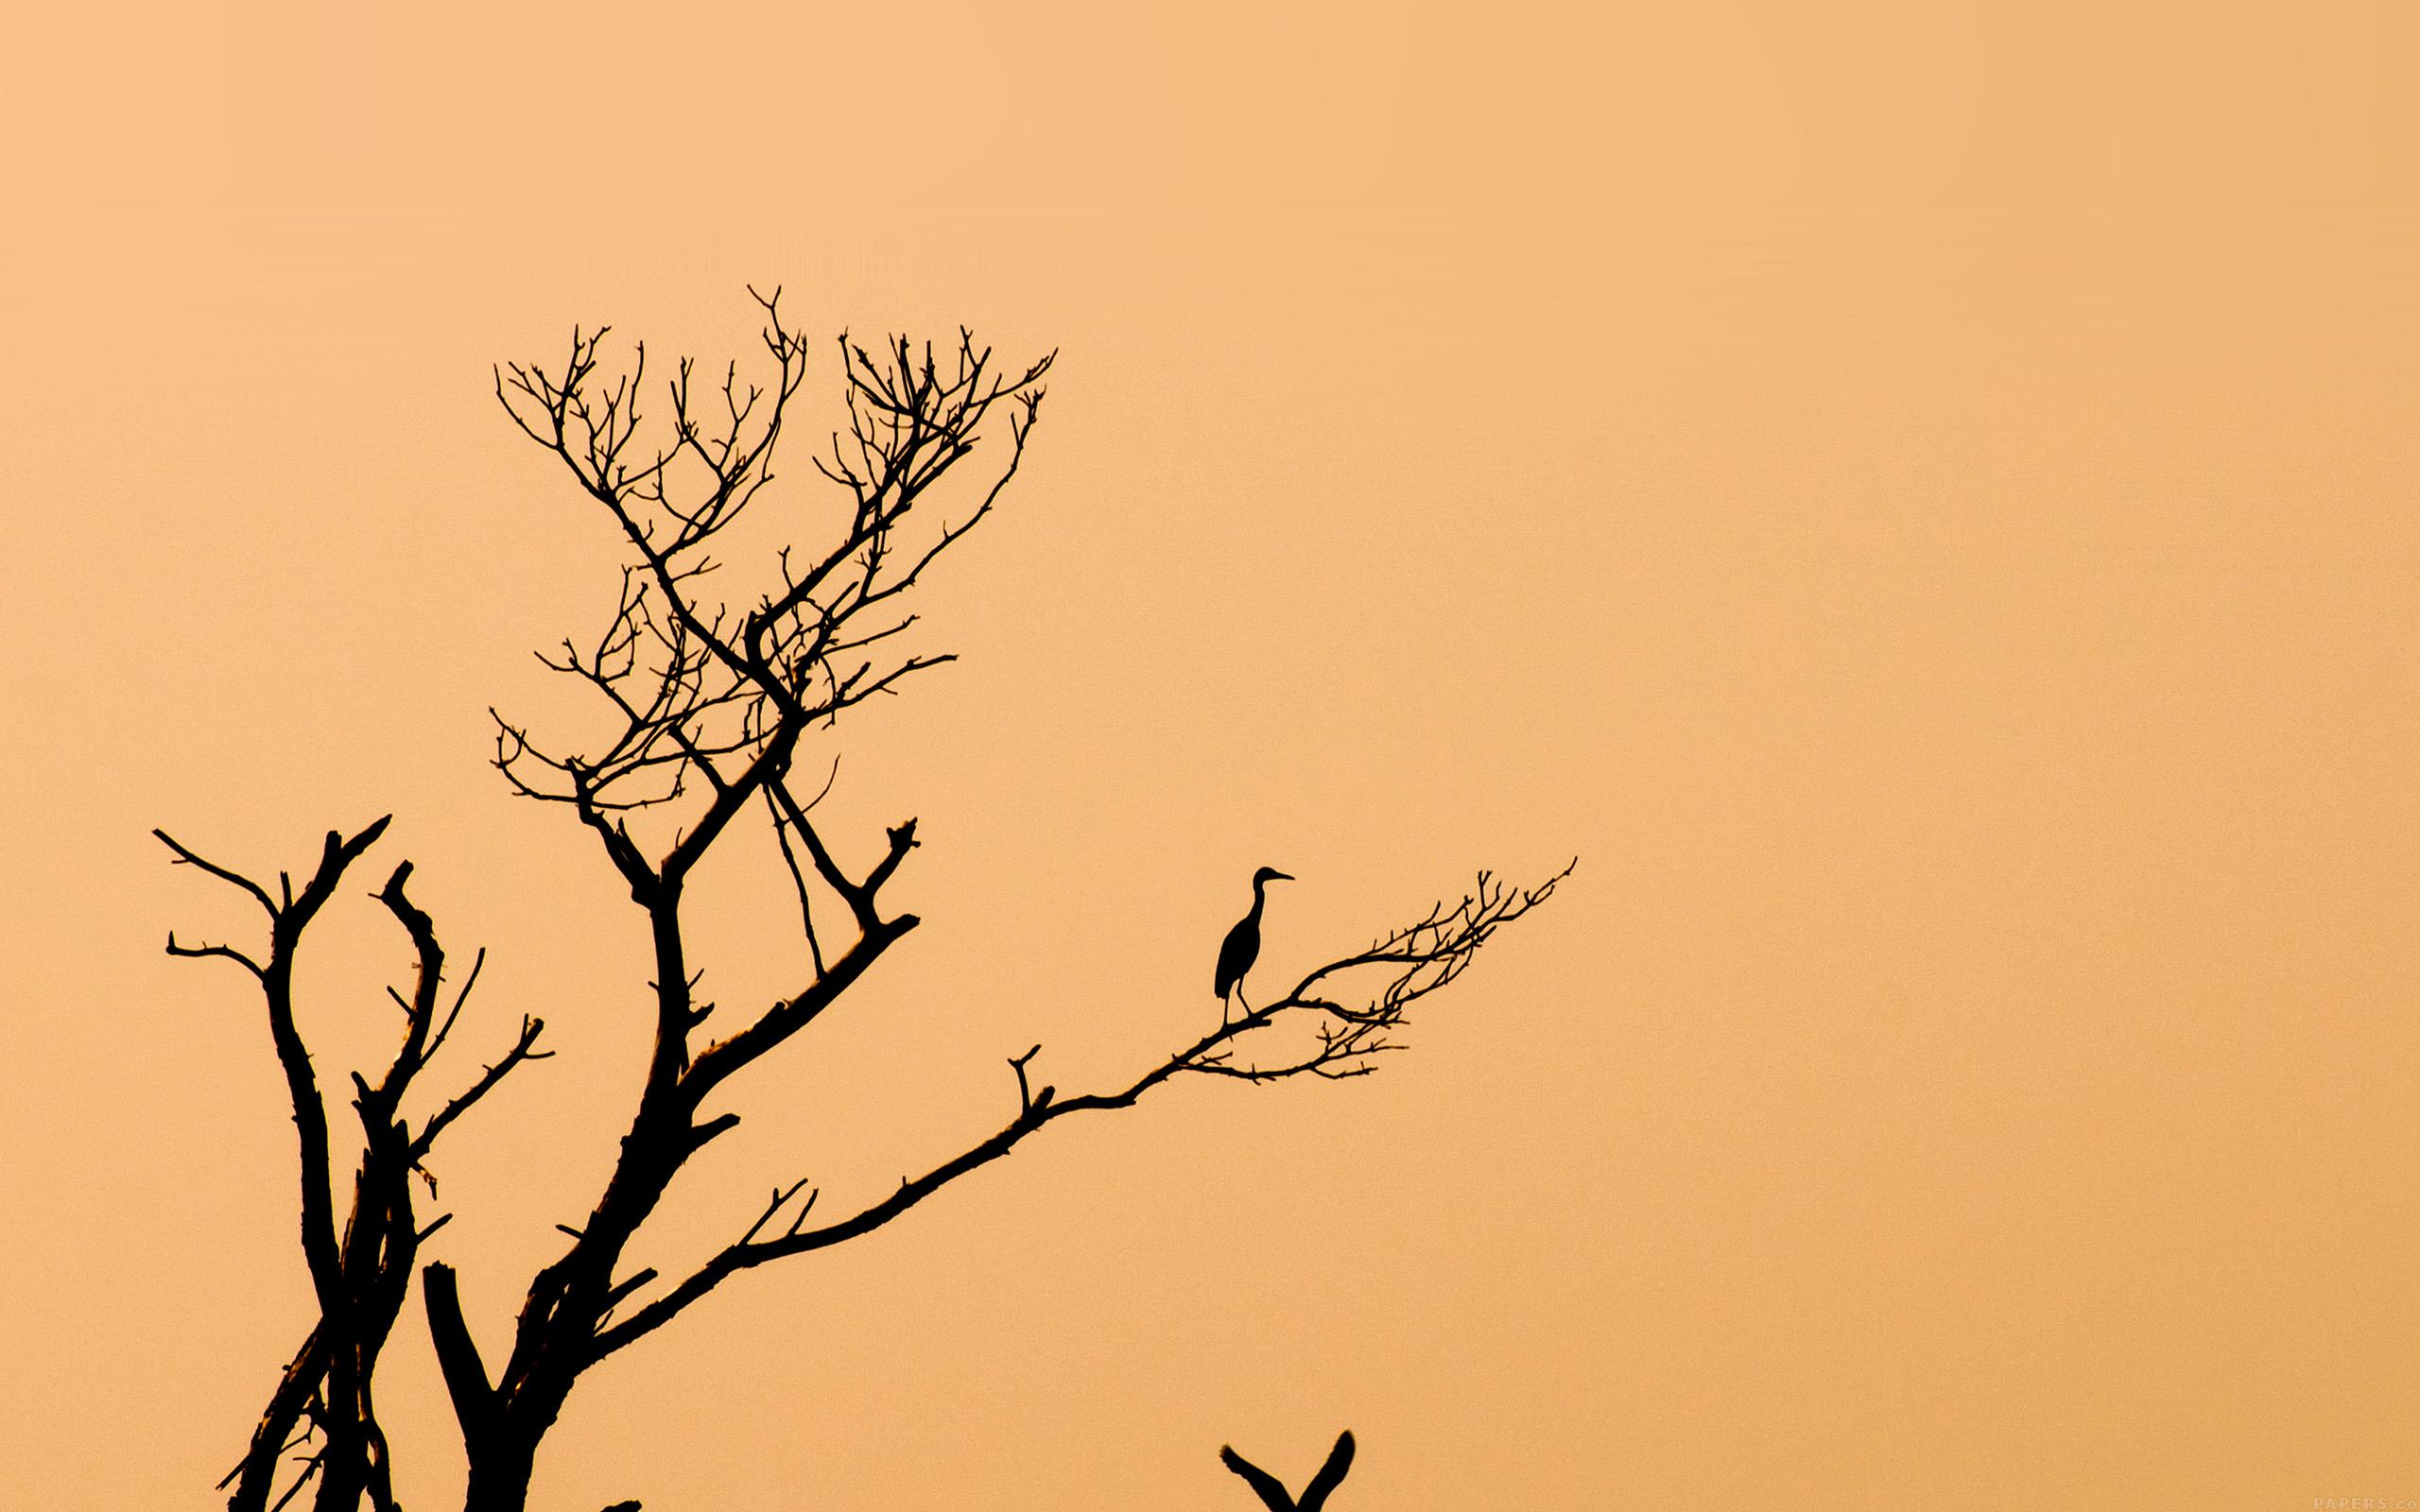 Minimalist Parallax Hd Iphone Ipad Wallpaper: Mk96-bird-sunset-tree-nature-minimal